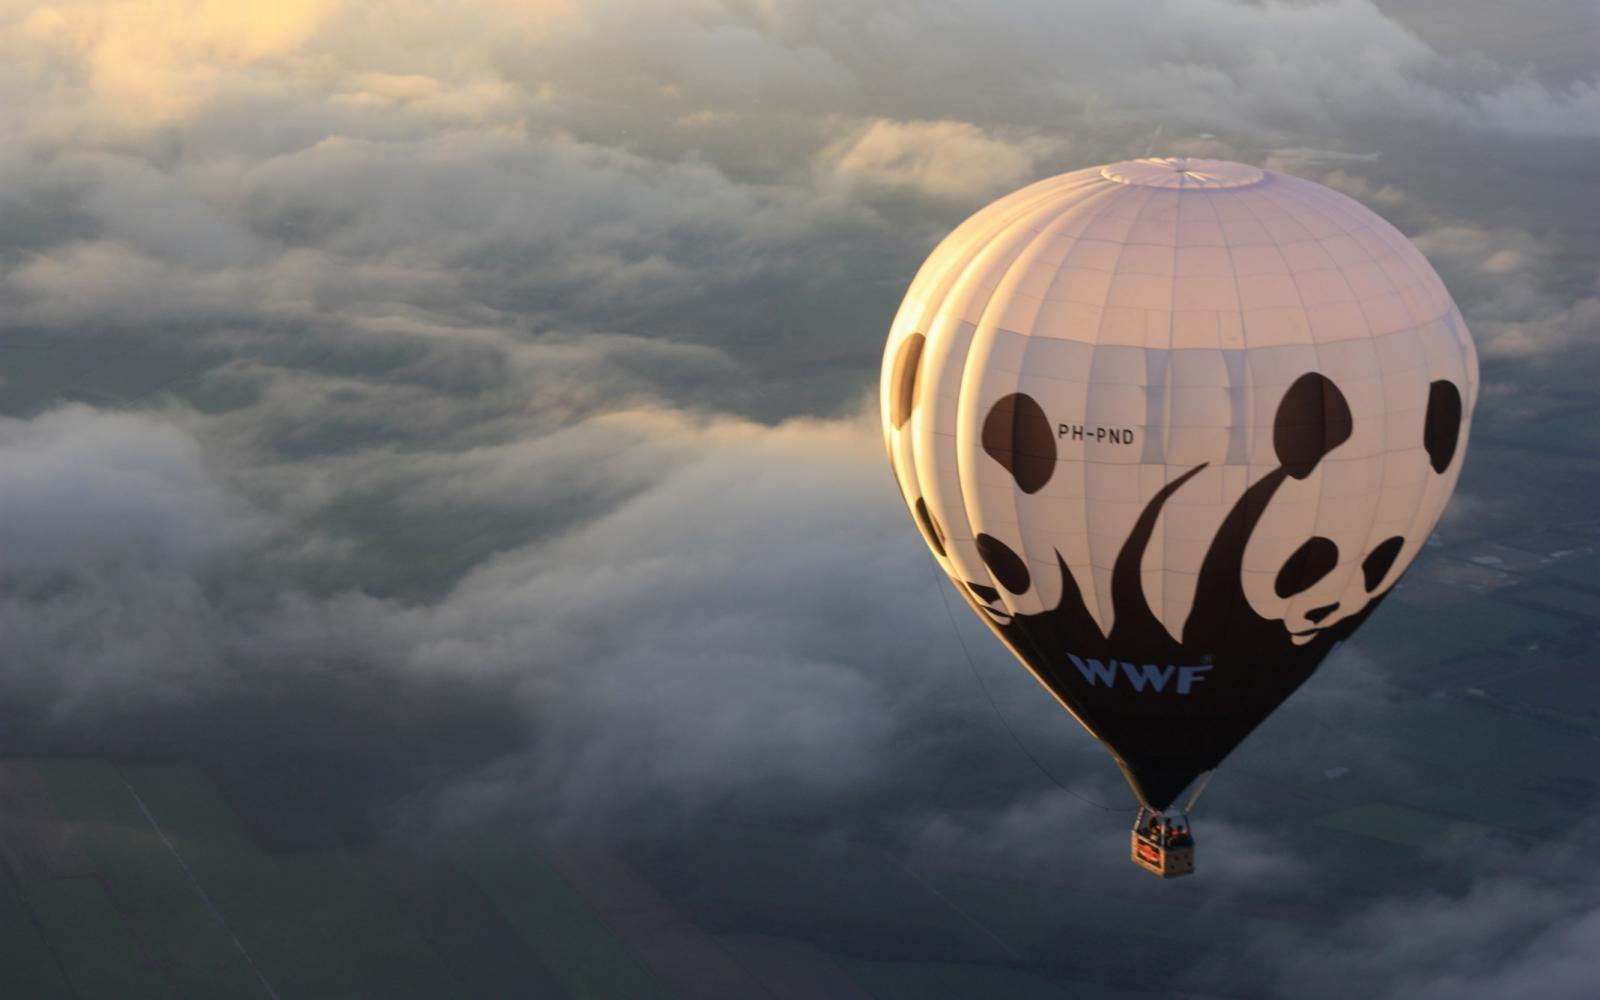 Testamento collabore avec l'association WWF